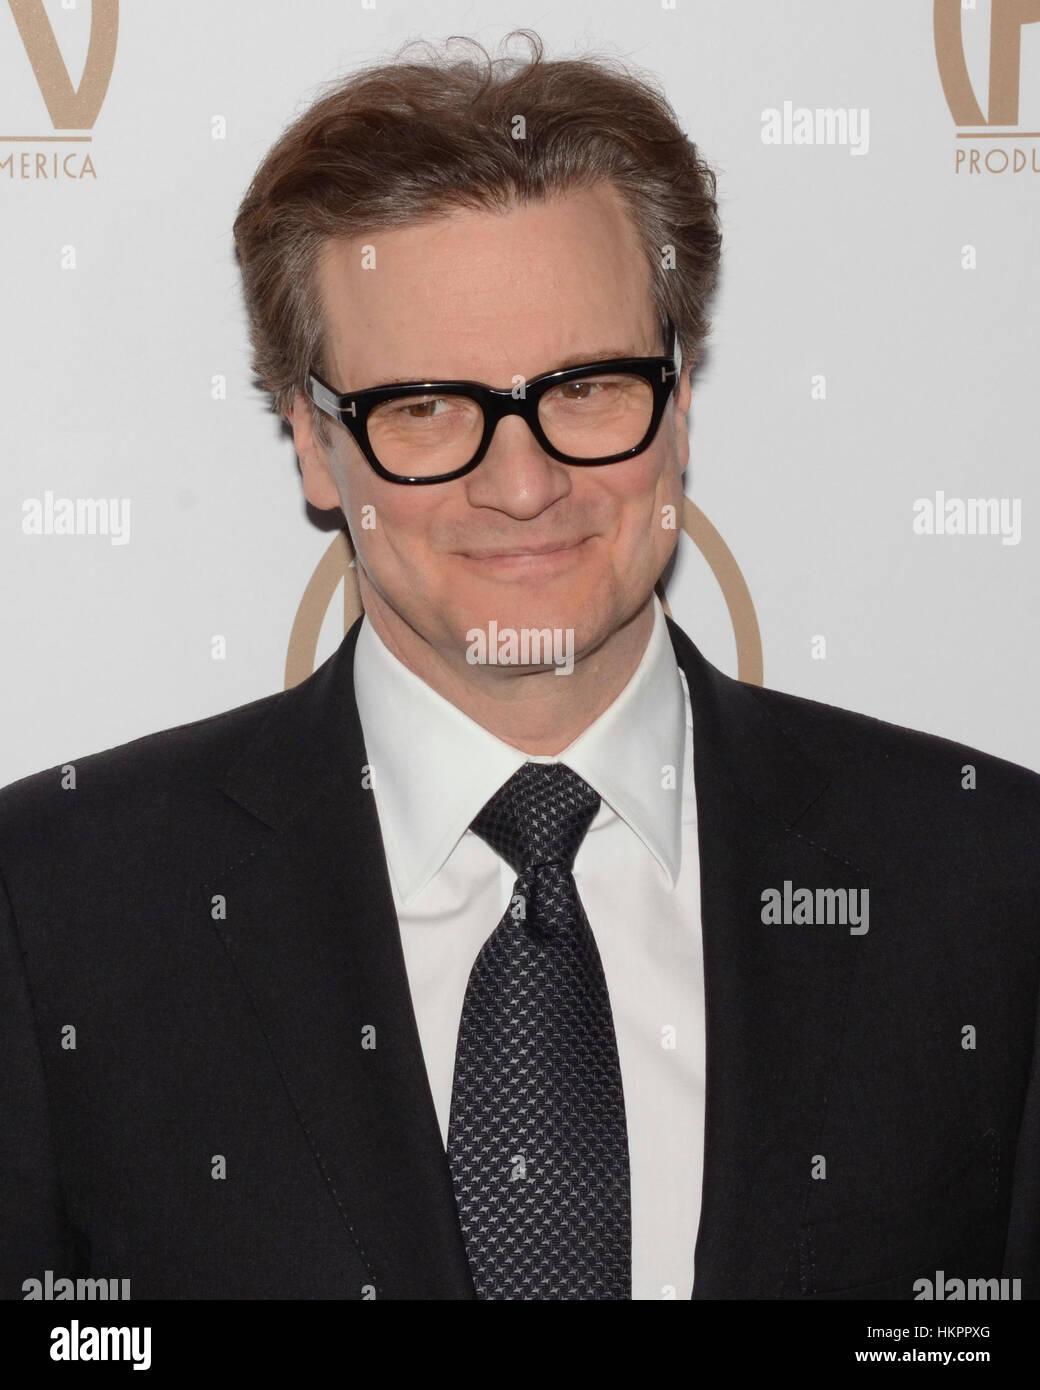 Colin Firth kommt bei der 28. Annual Hersteller Guild Awards im The Beverly Hilton Hotel in Beverly Hills, Kalifornien Stockbild